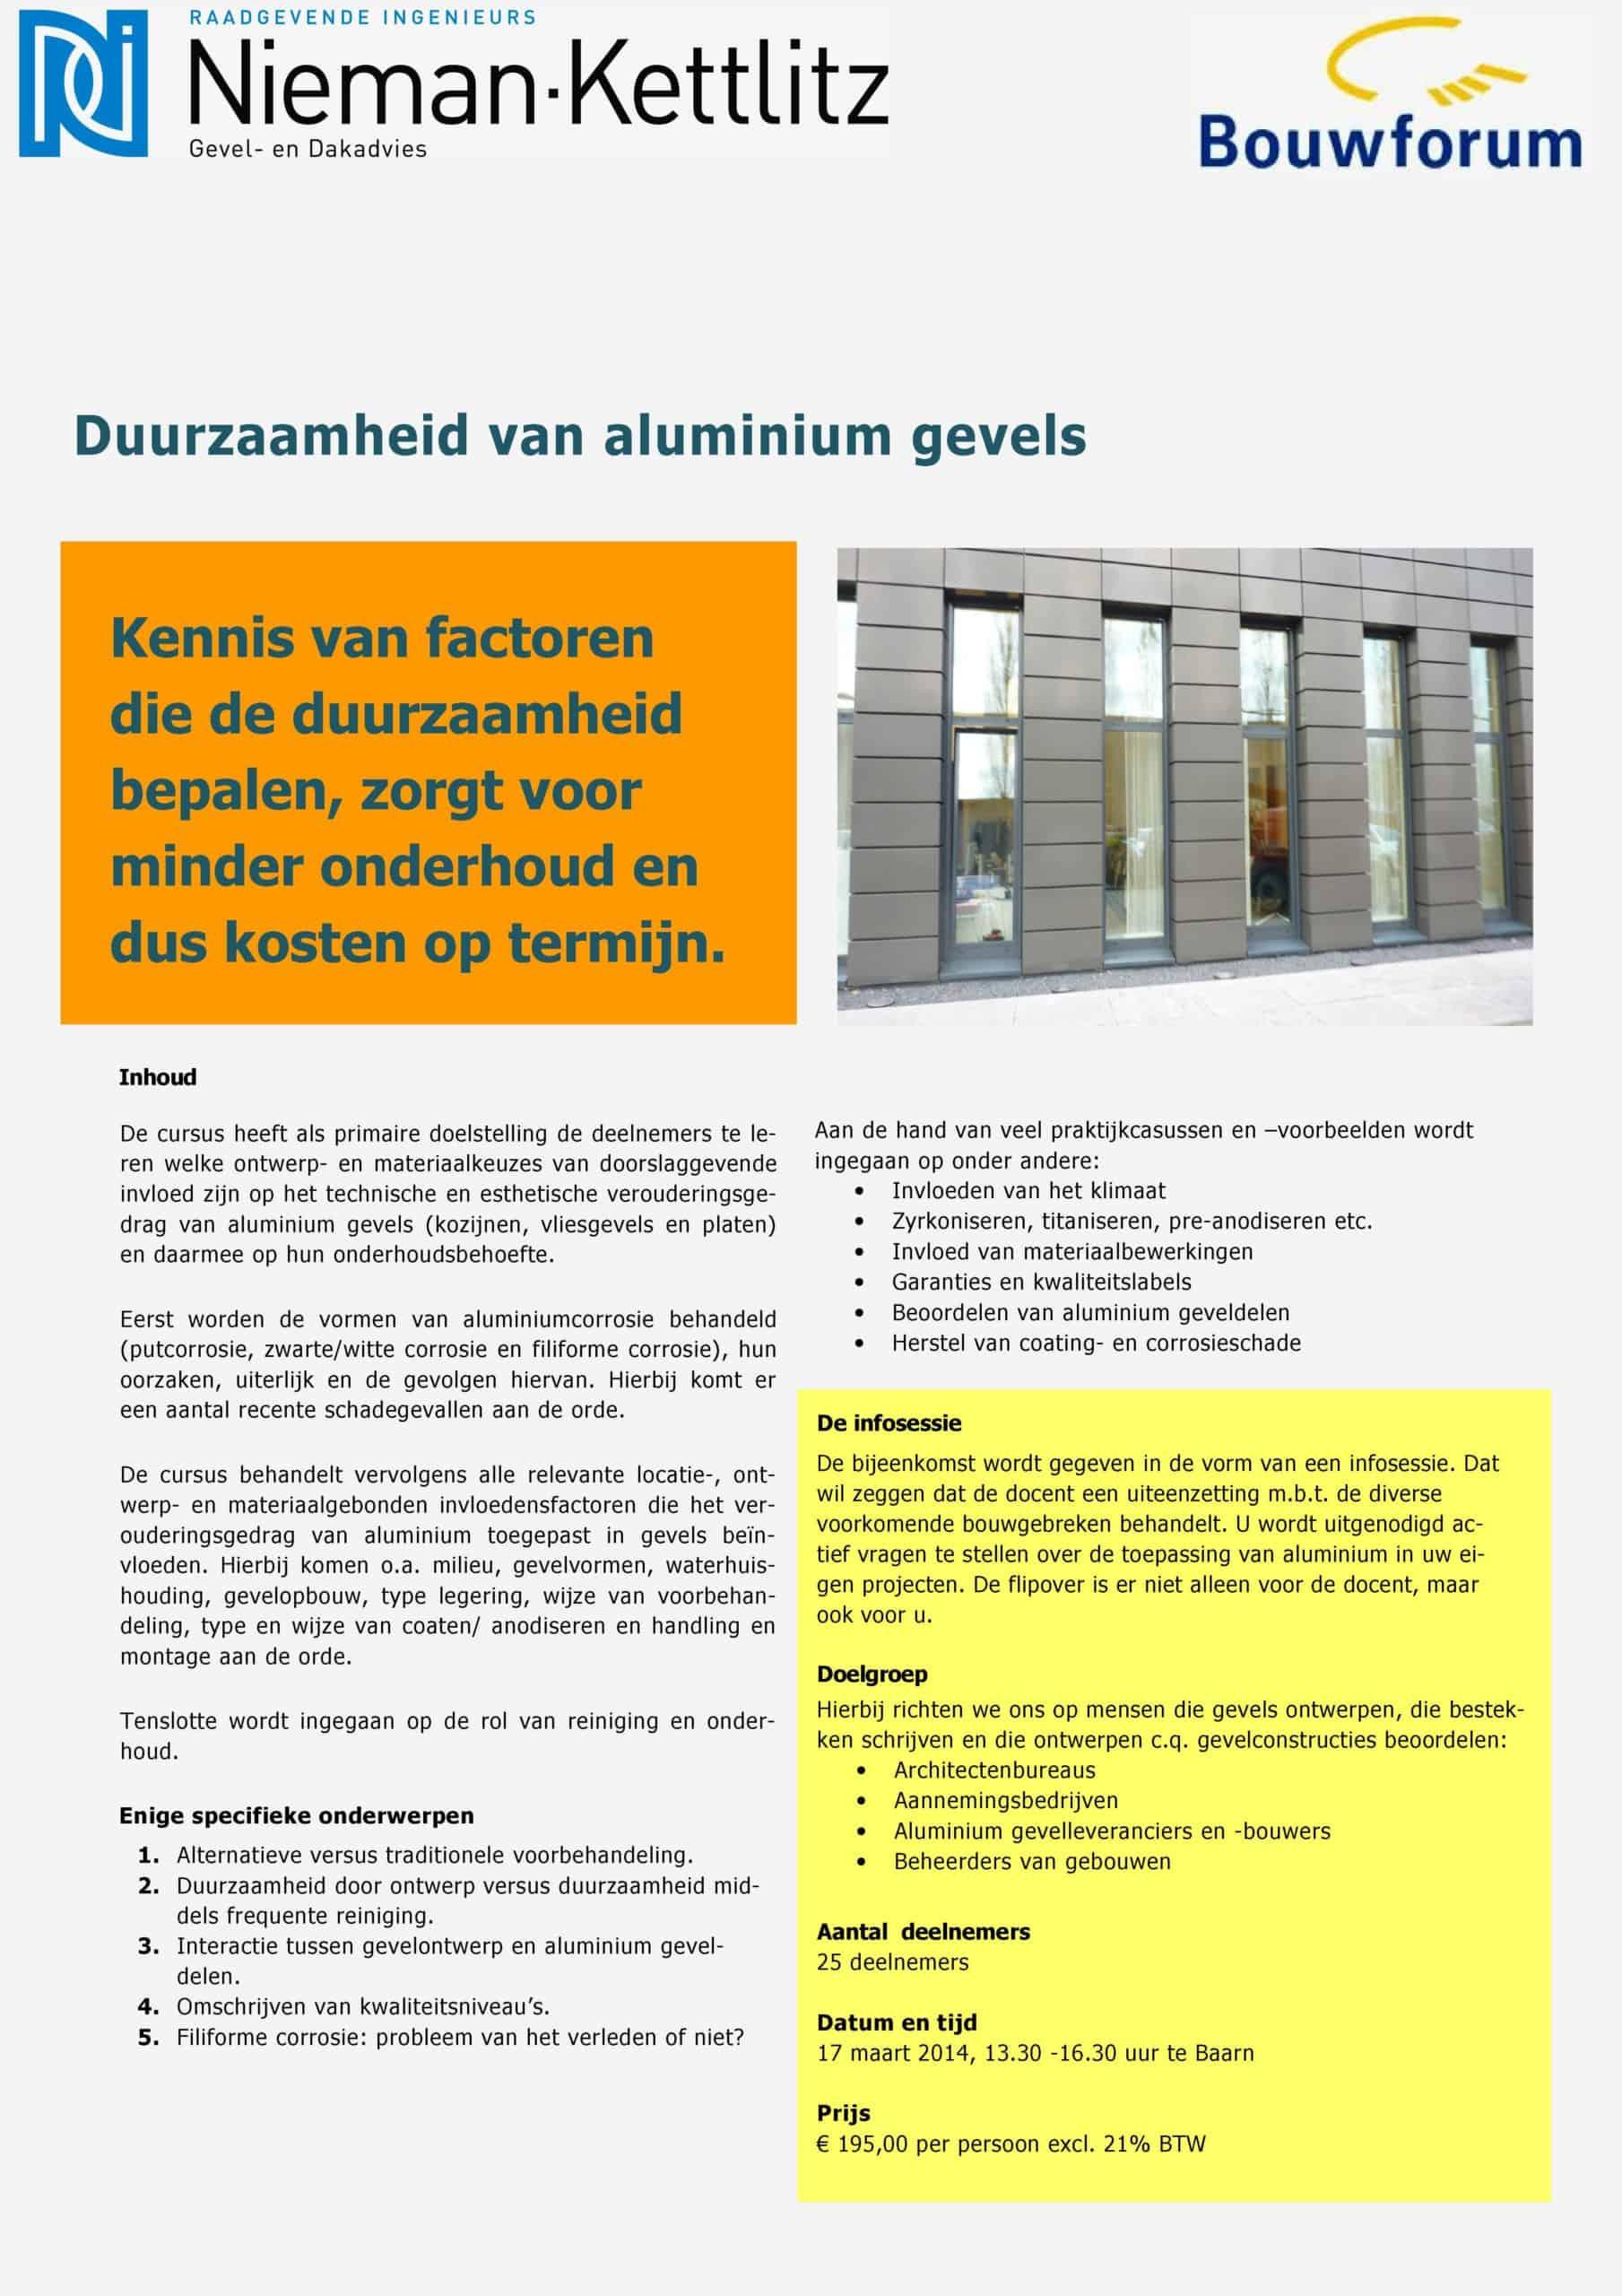 02-Info-Duurzaamheid-aluminium-gevels-3-scaled